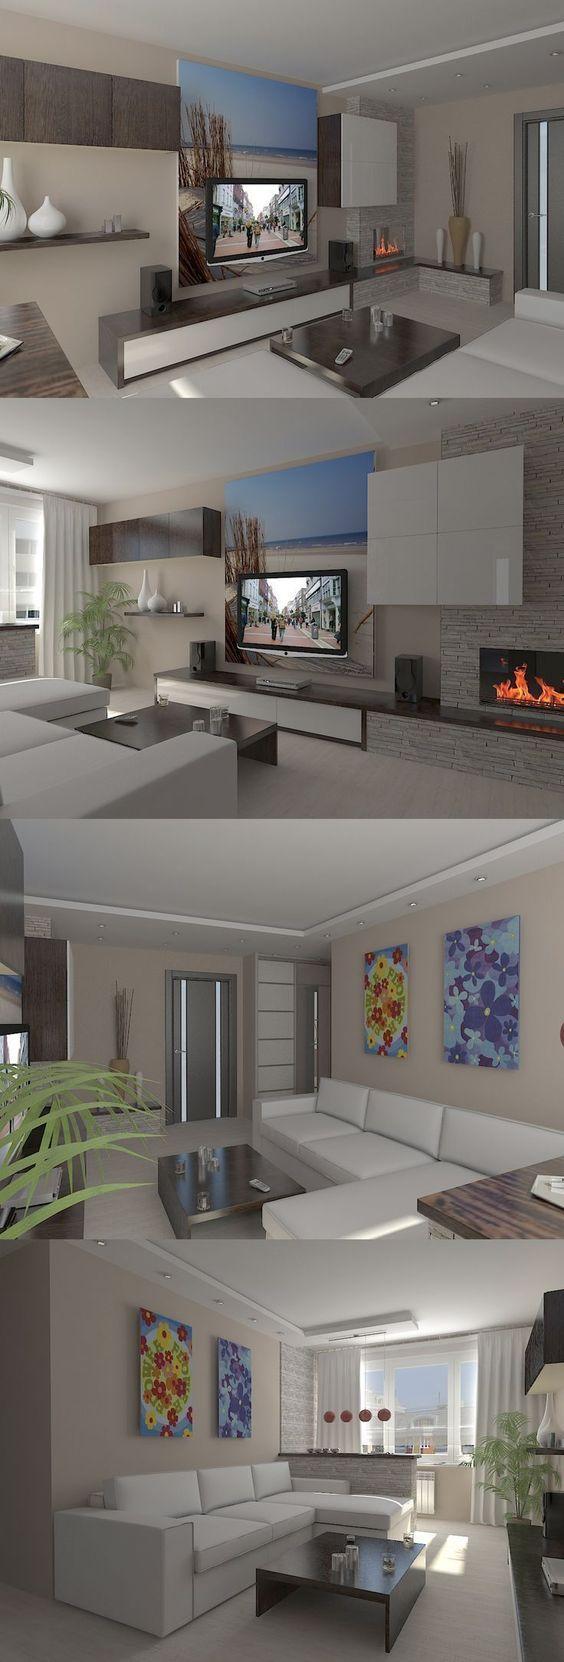 Ideas decoracion de interiores : Como decorar con lineas #living #home #decor #livinghomedecor #dreamhome #diyhomedecor #diy #decoration